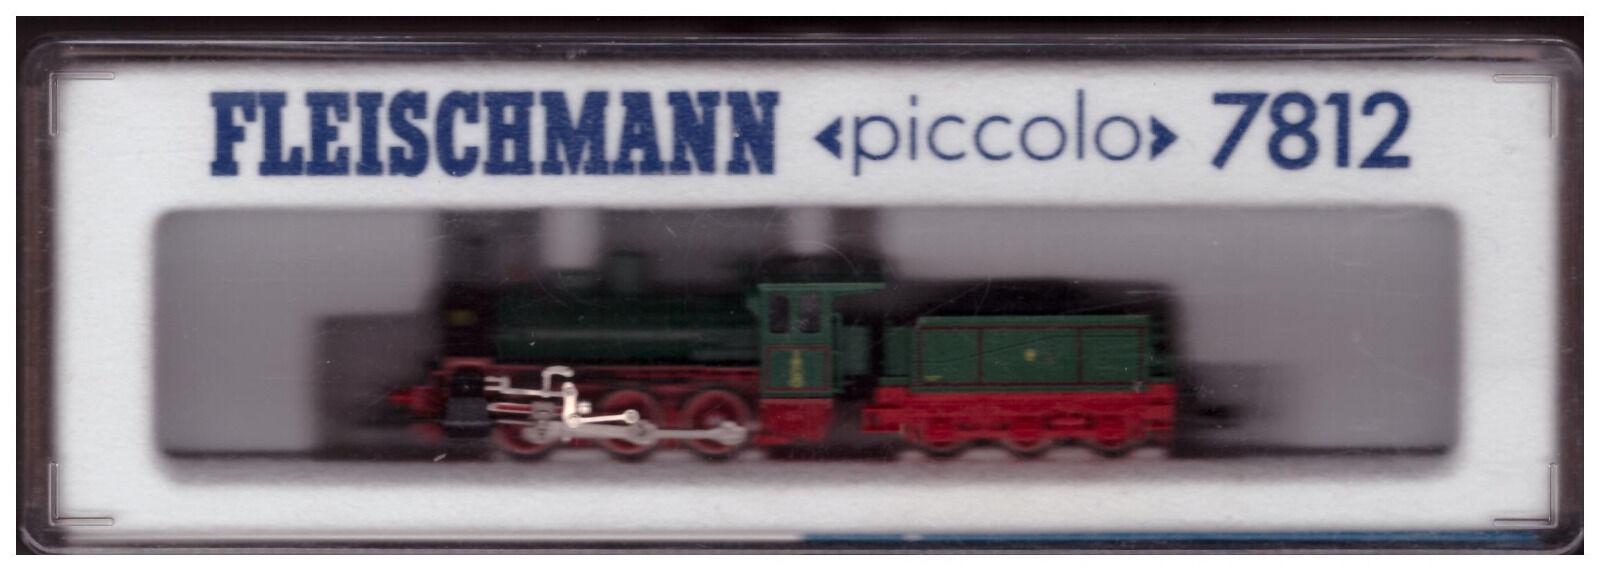 Fleischmann 7812: STILO Tenderlok, verde/nero, 'Il paese messaggero' 3915 Danzica